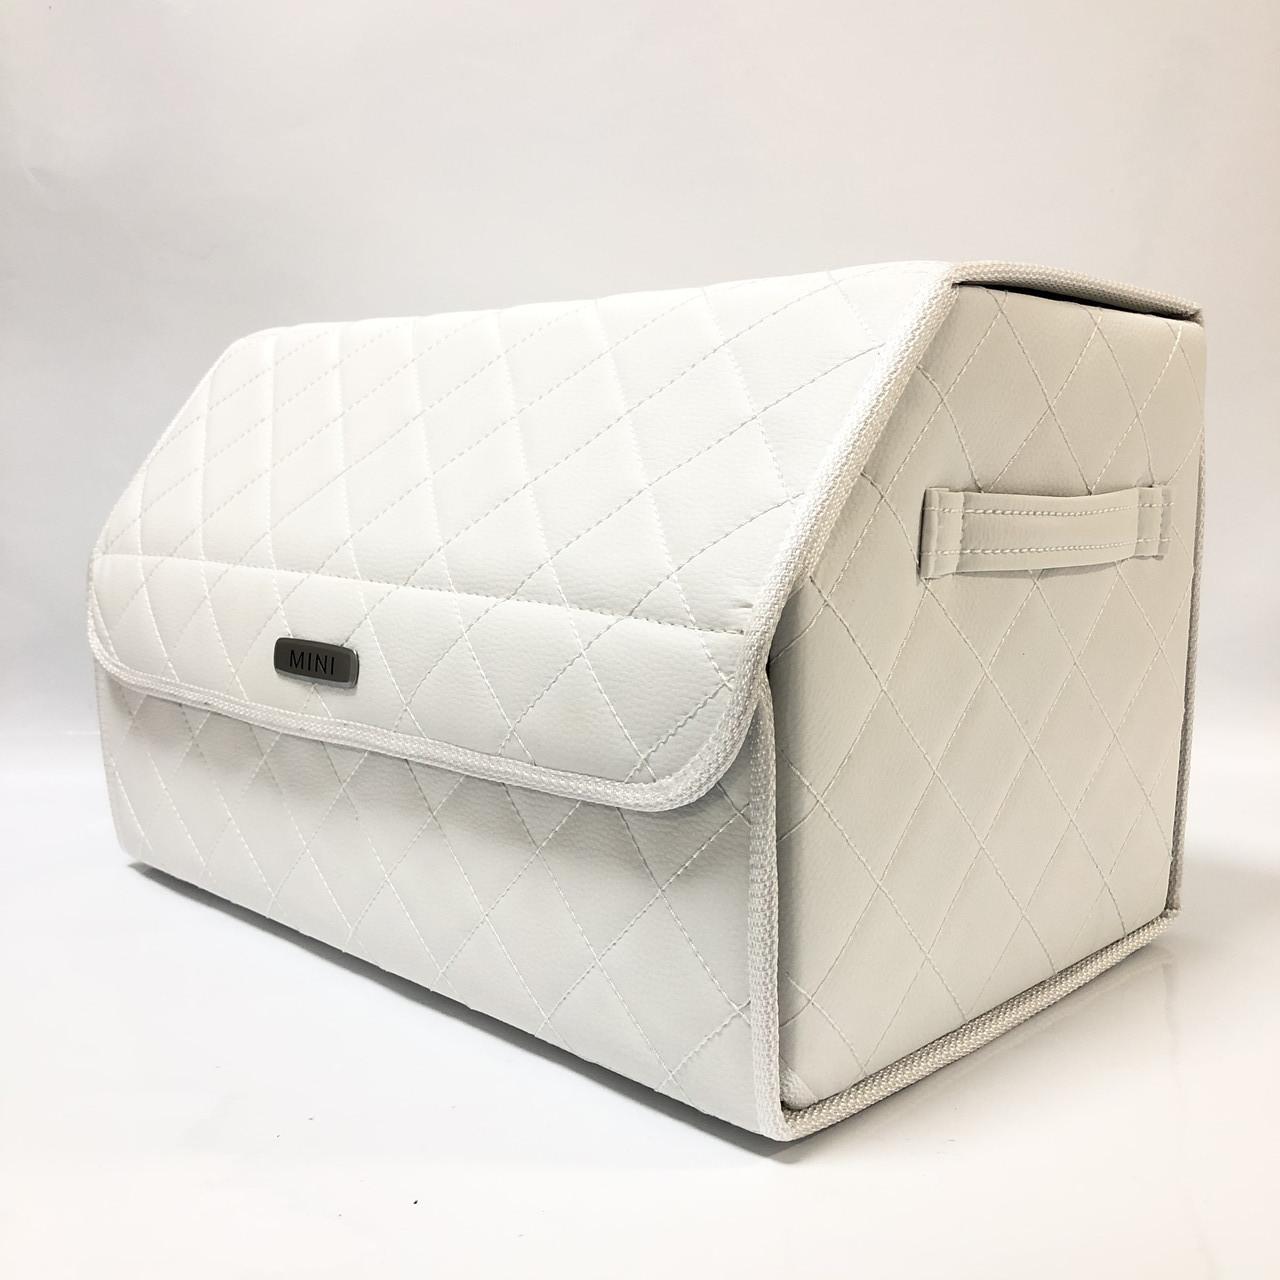 Саквояж с лого в багажник «MINI» I Органайзер в авто Белый Мини